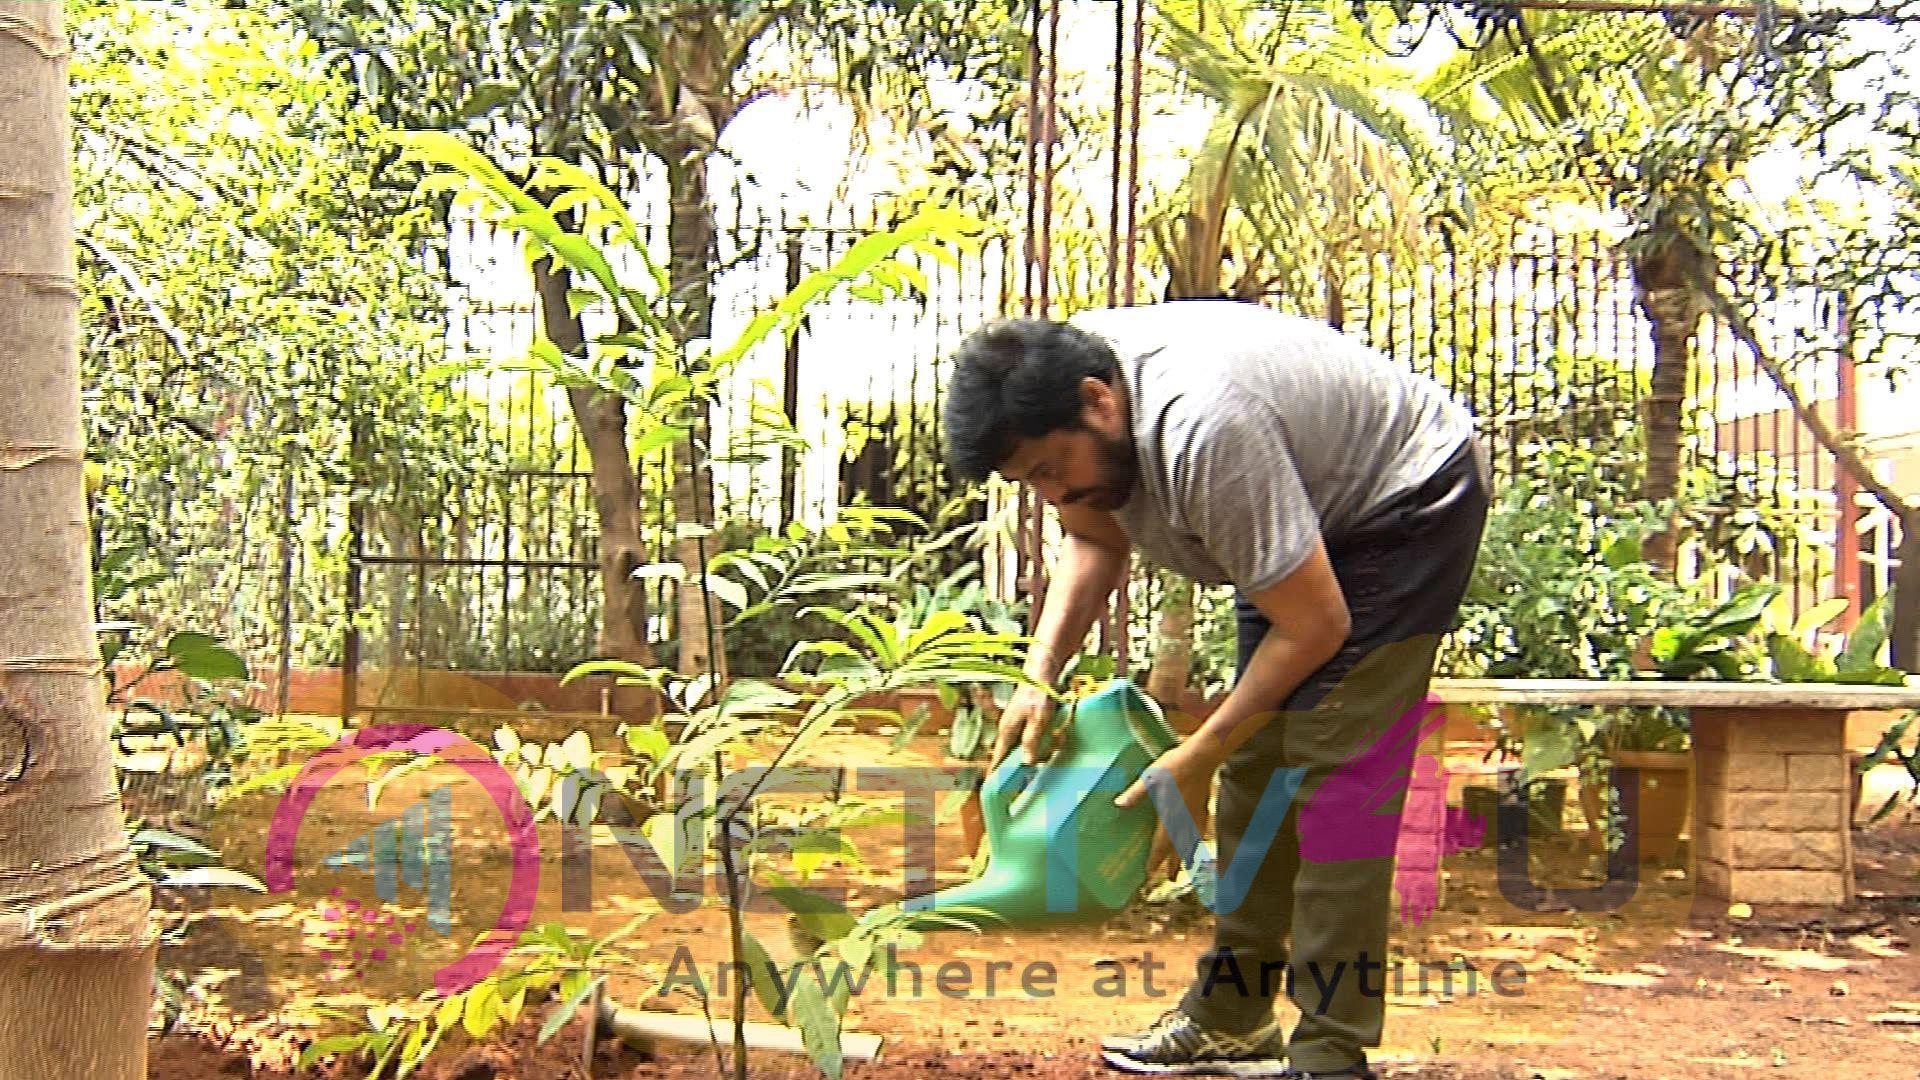 Megastar Chiranjeevi Saplings Planted Pics